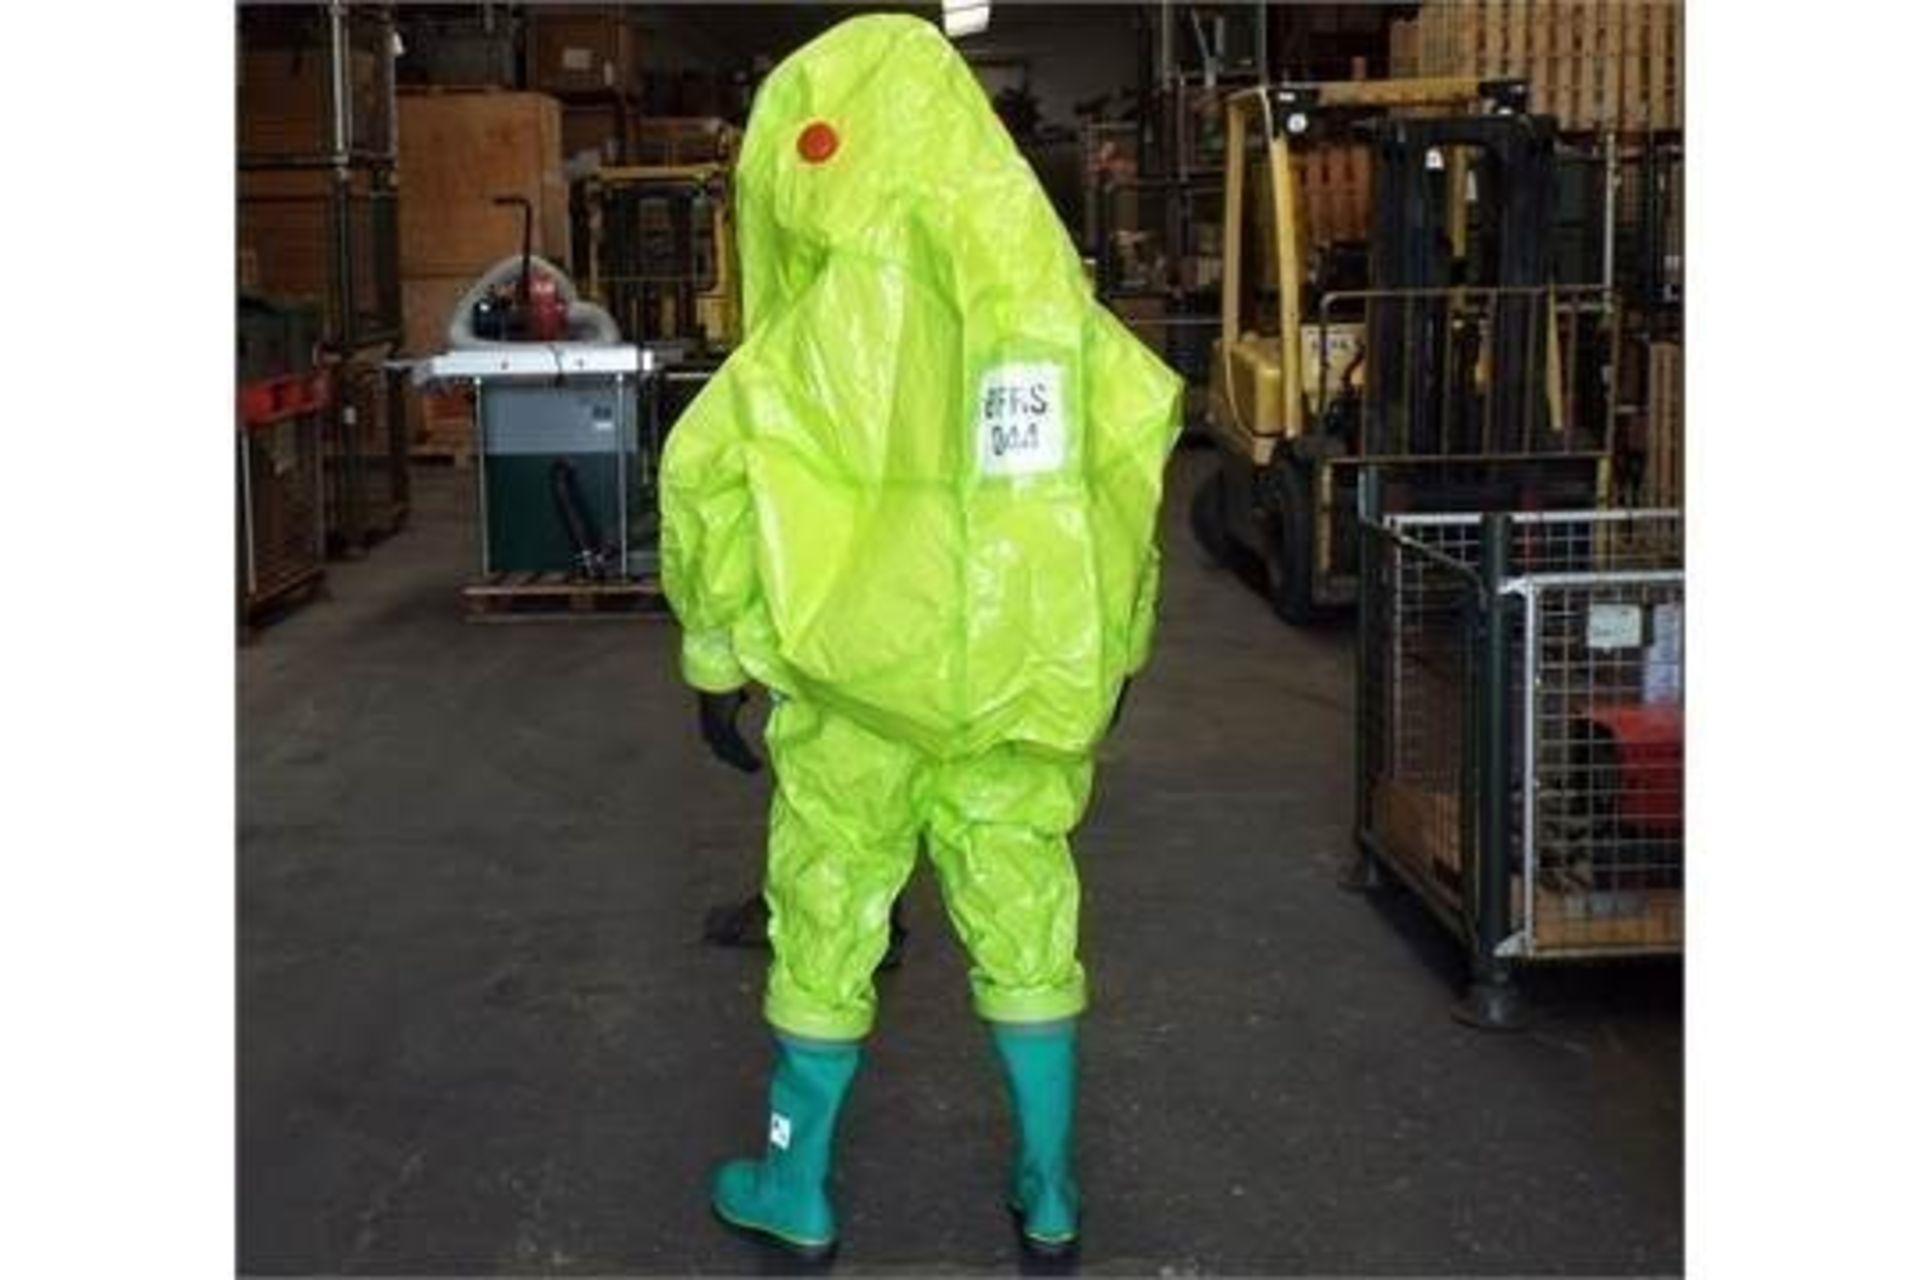 Lot 26802 - Q10 x Unissued Respirex Tychem TK Gas-Tight Hazmat Suit. Size Large